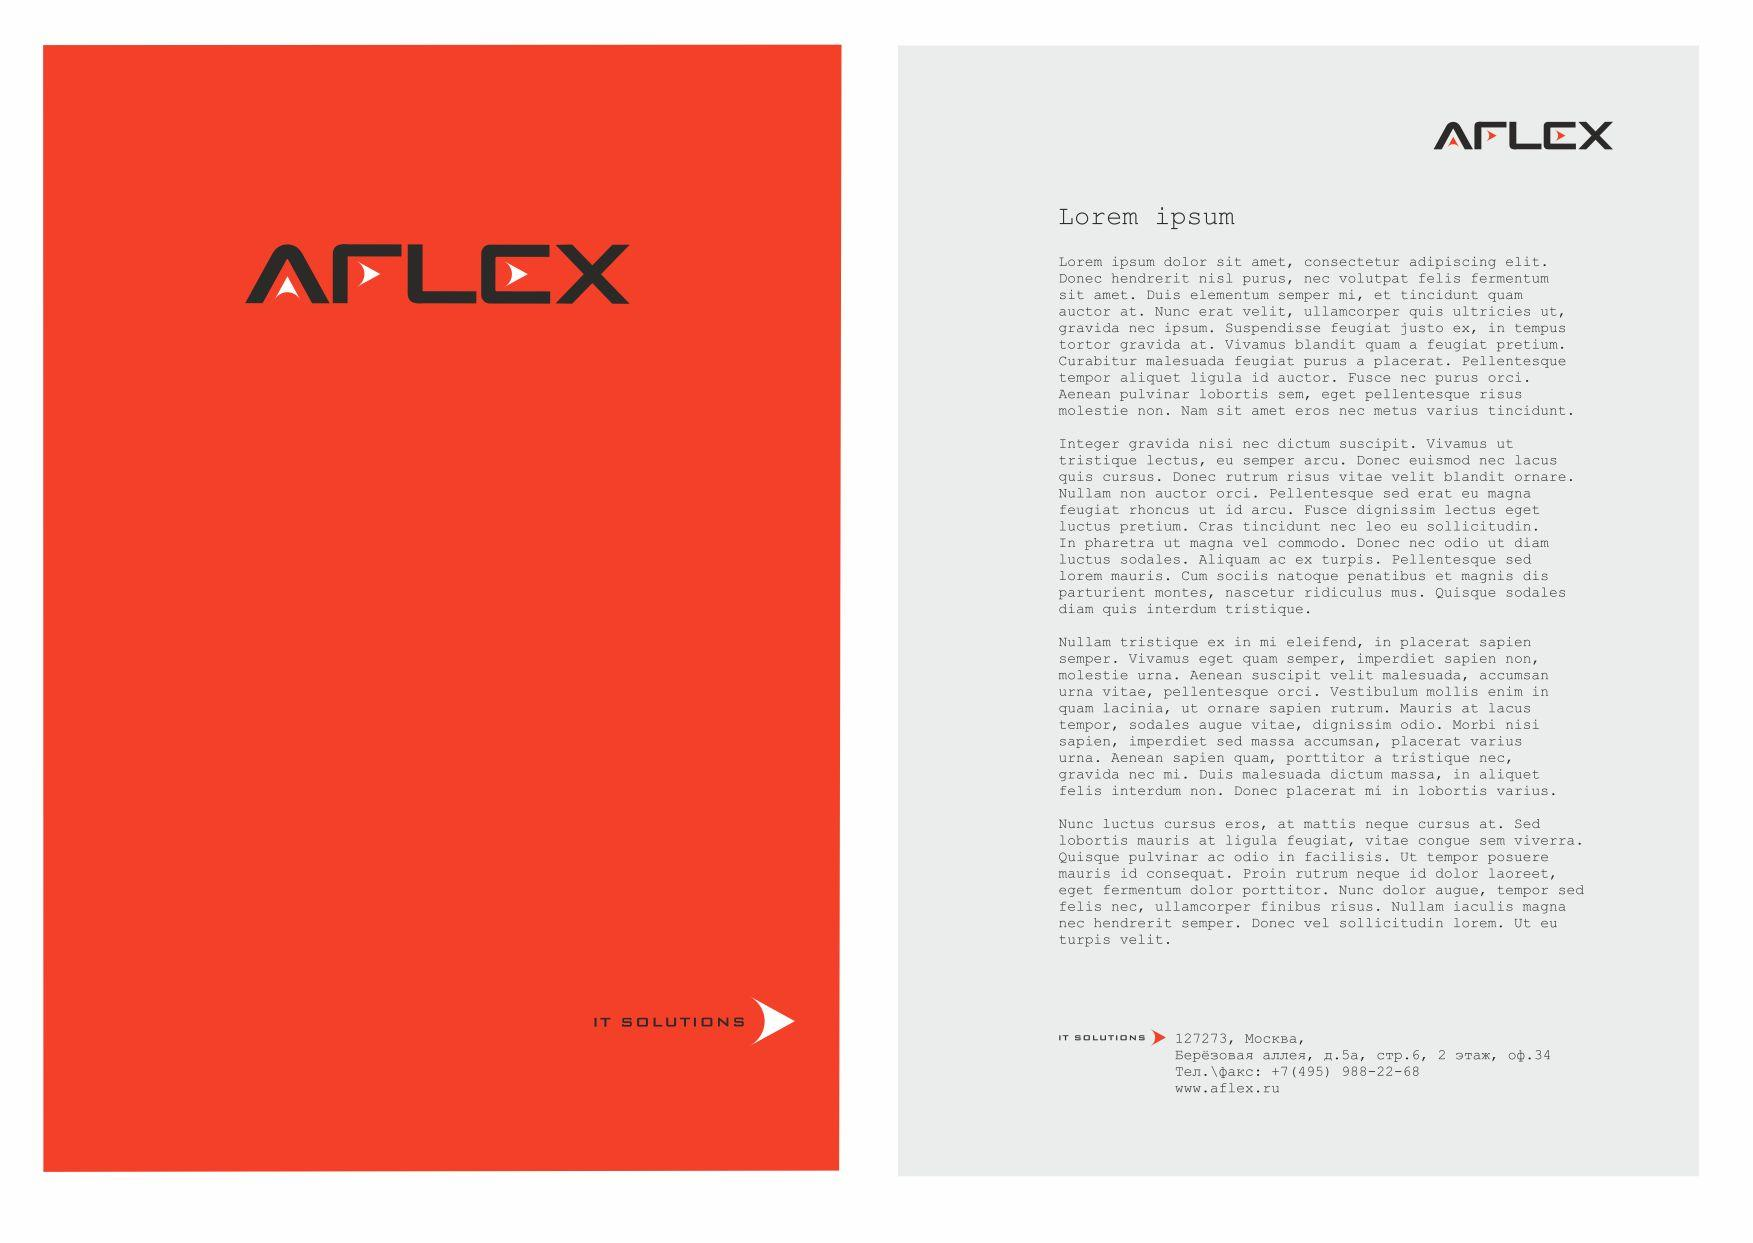 AFLEX-3